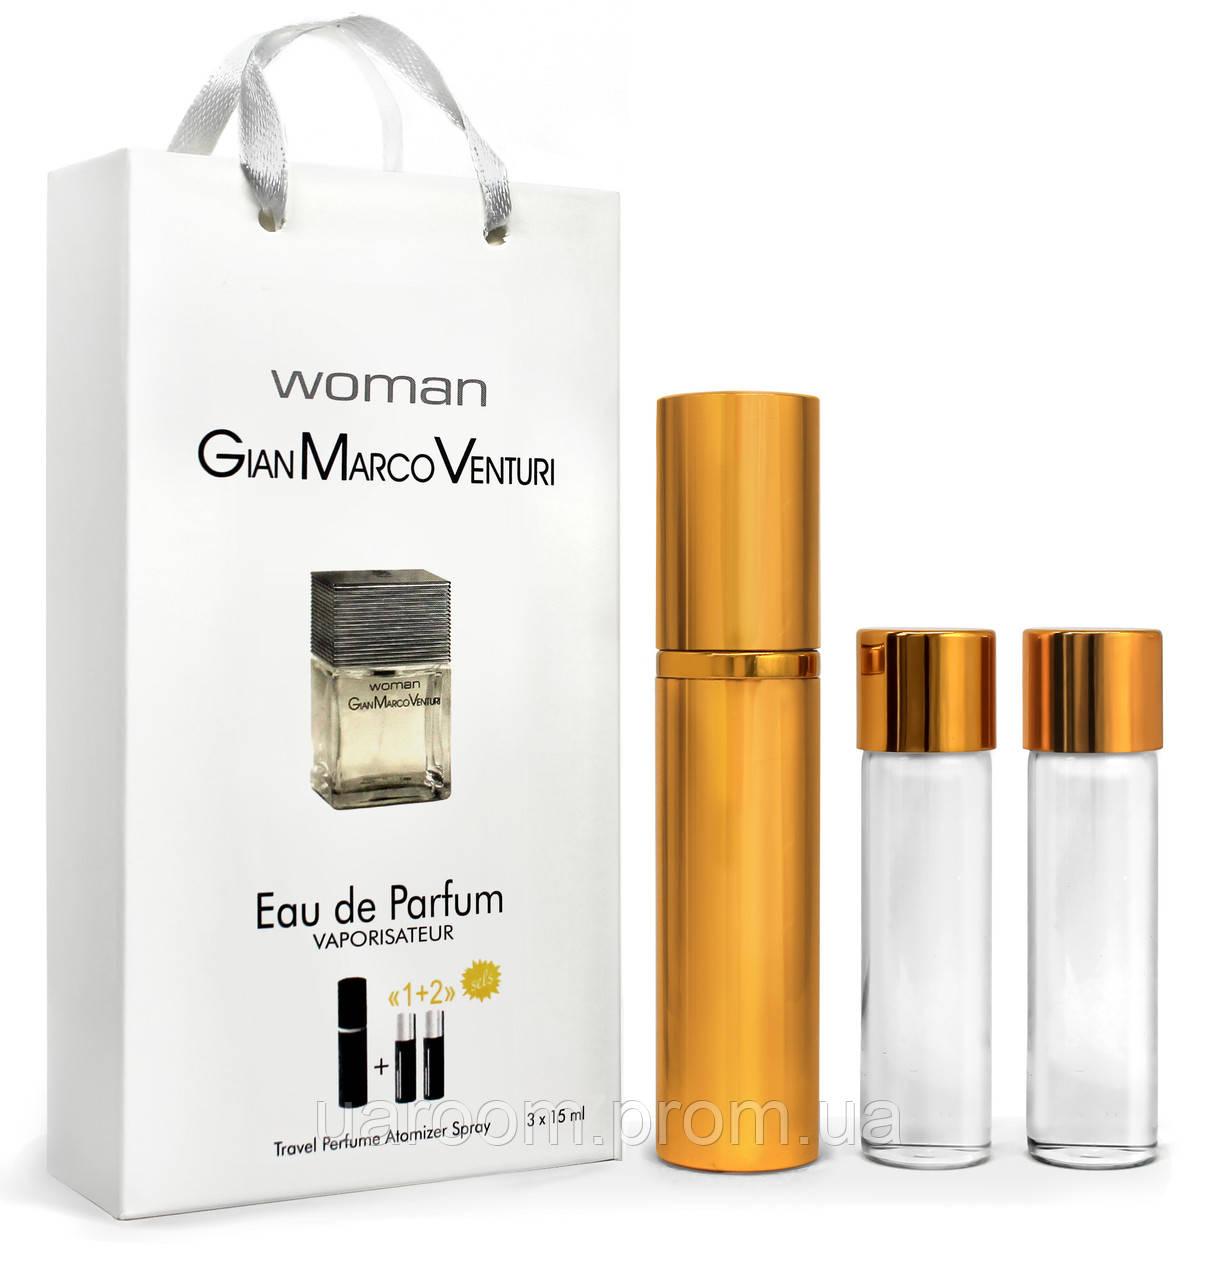 Мини-парфюм женский GIAN MARCO VENTURI woman, 3х15 мл.